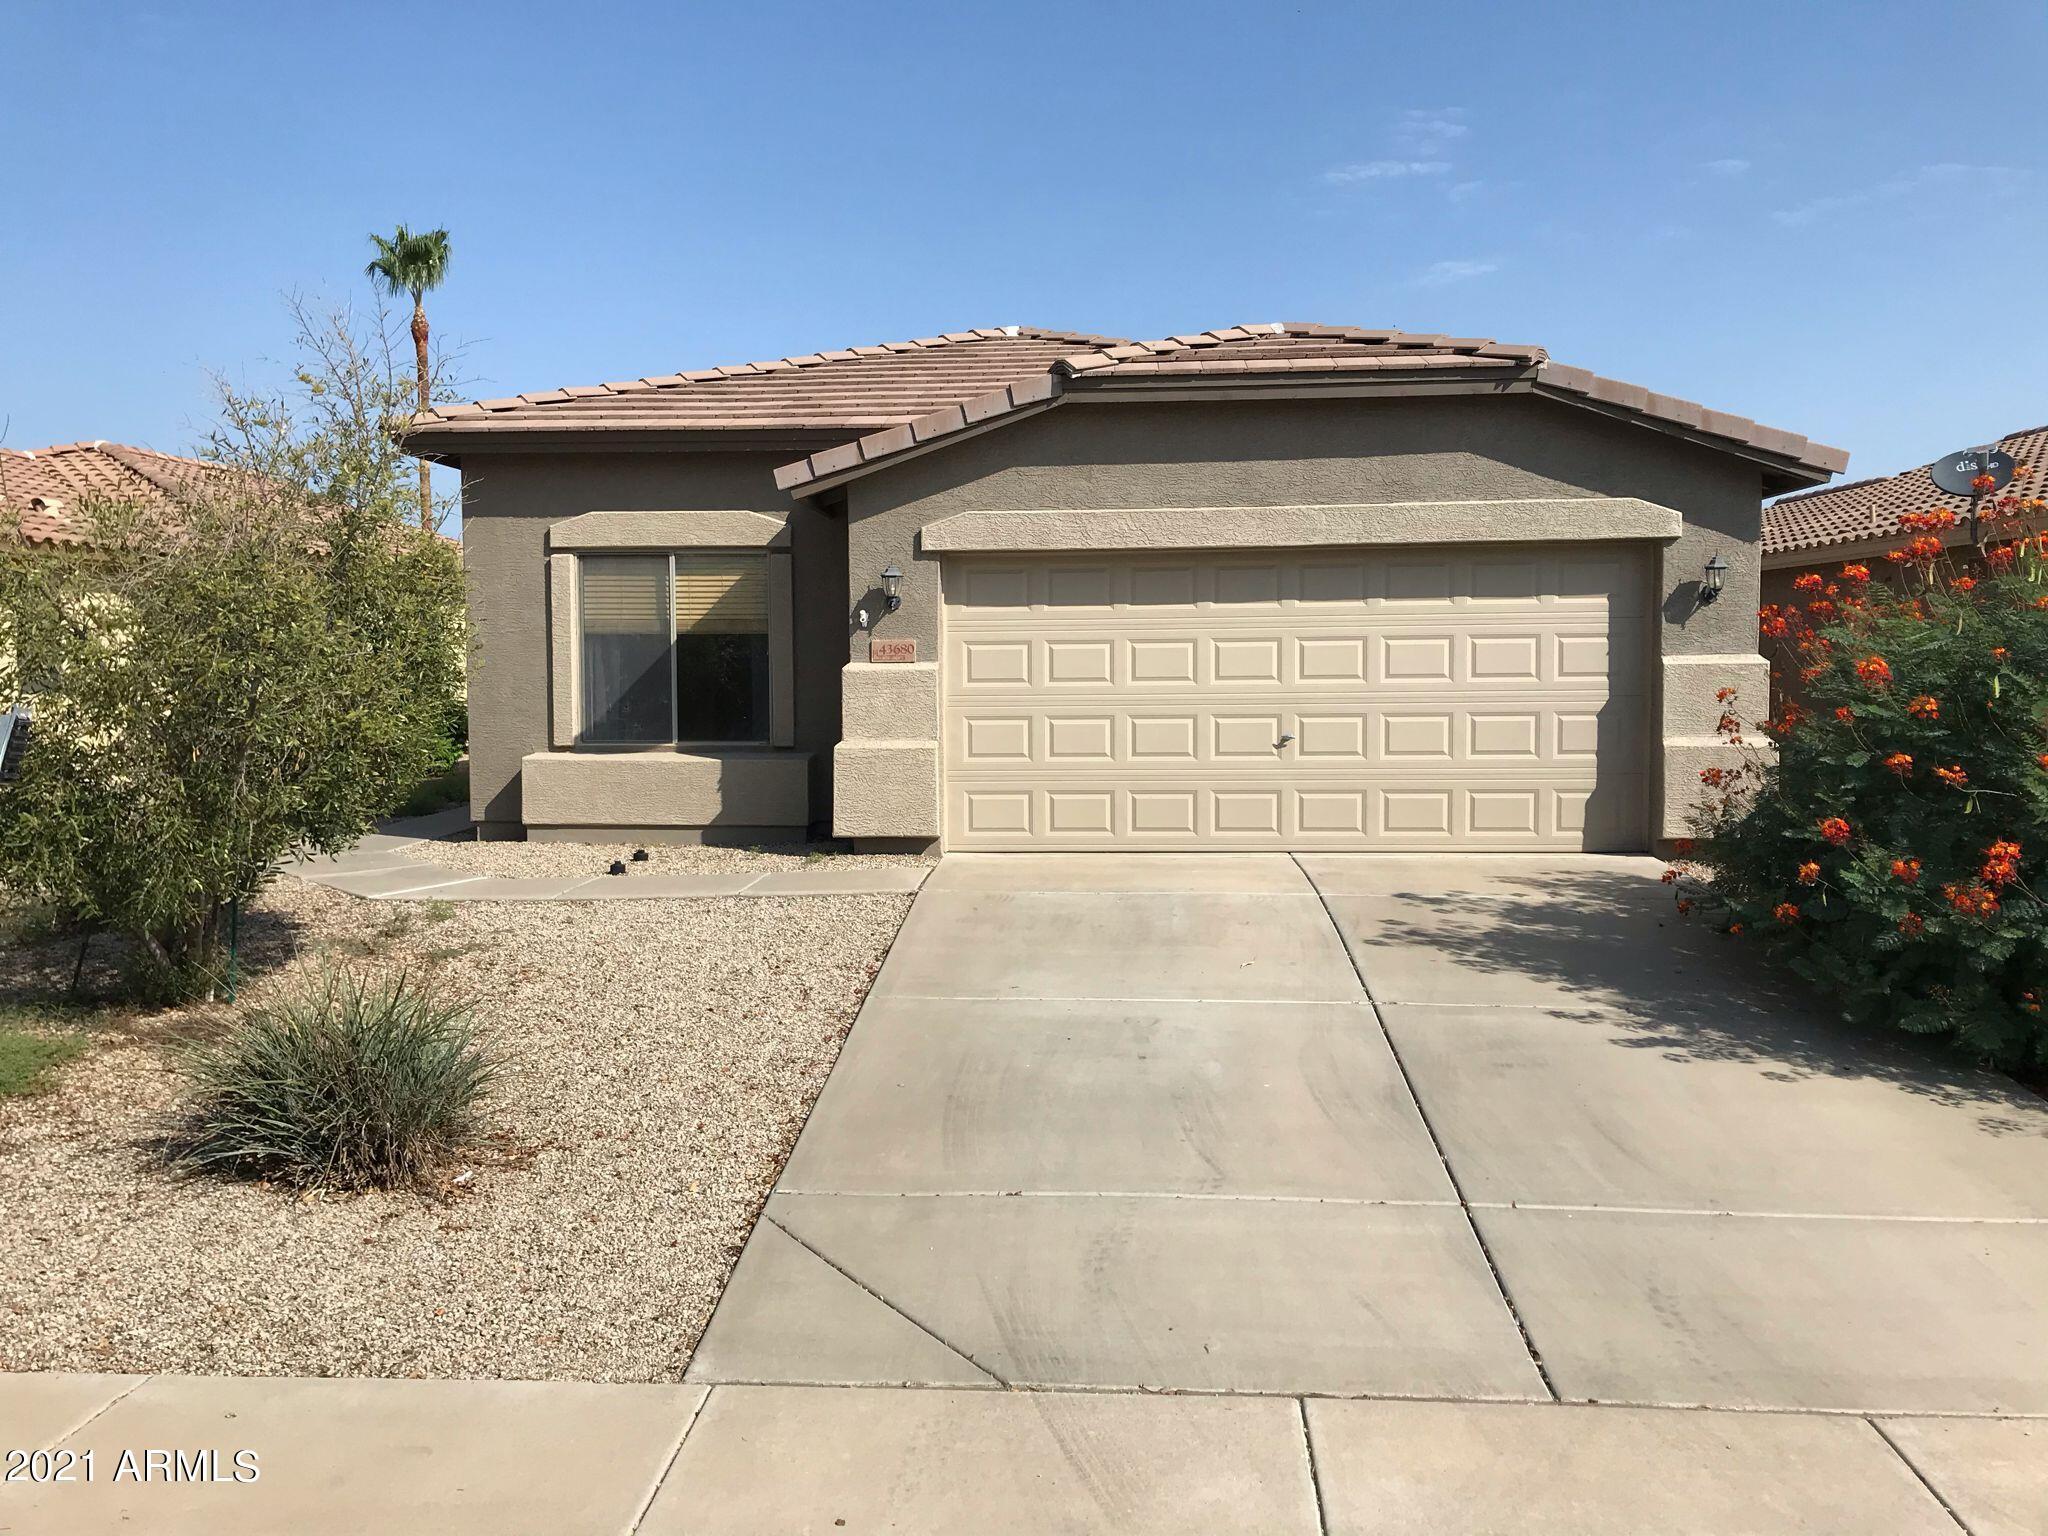 43680 W BEDFORD Drive, Maricopa, AZ 85138